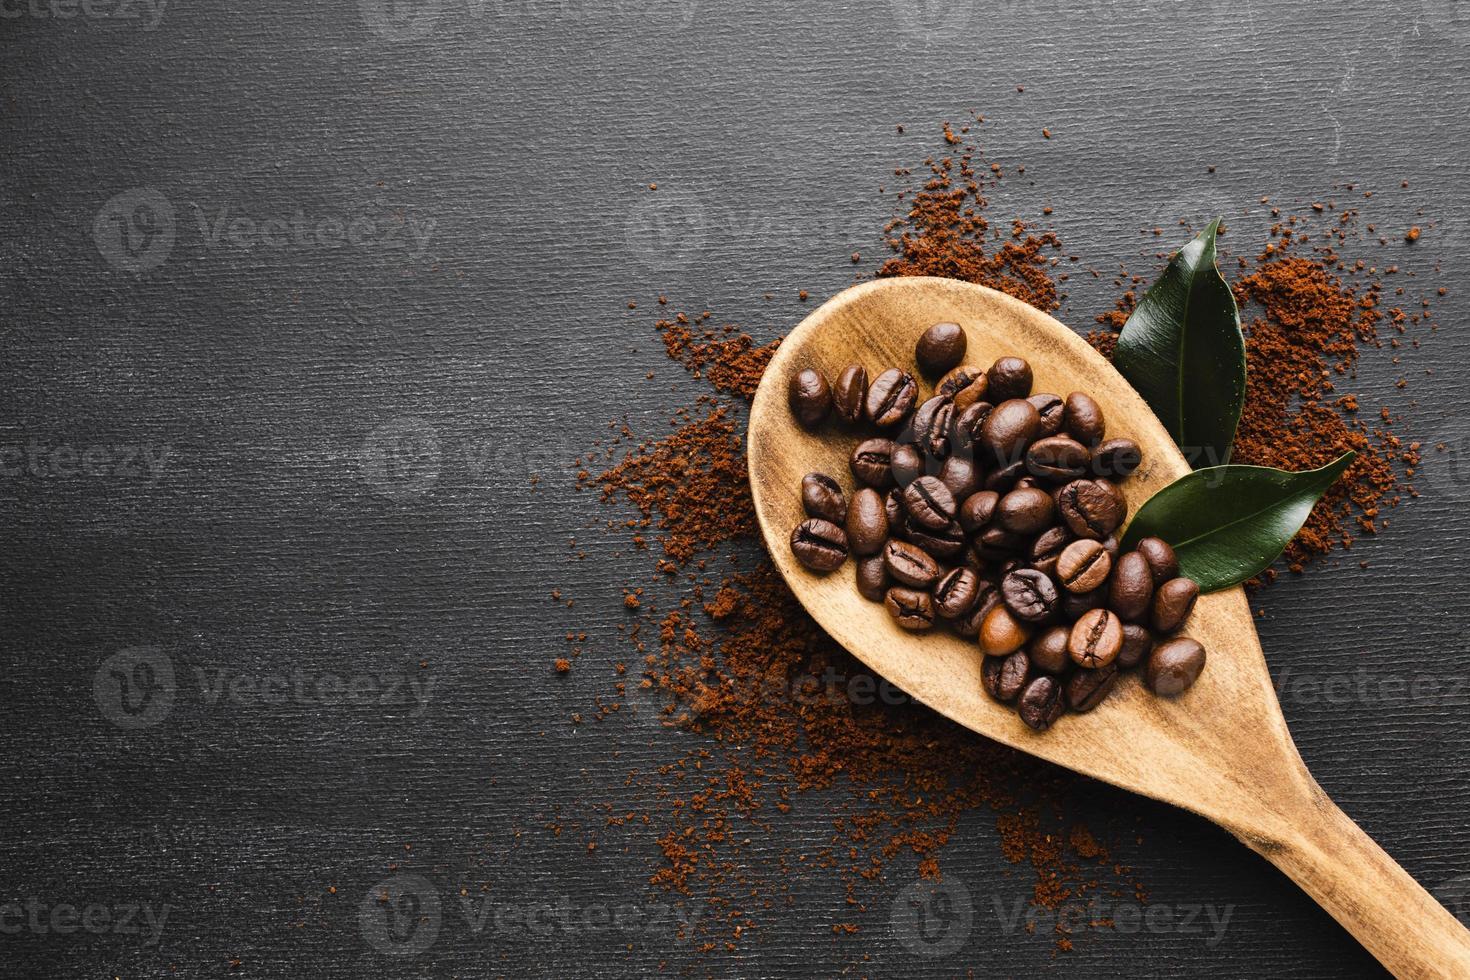 misurino da caffè in tavola foto